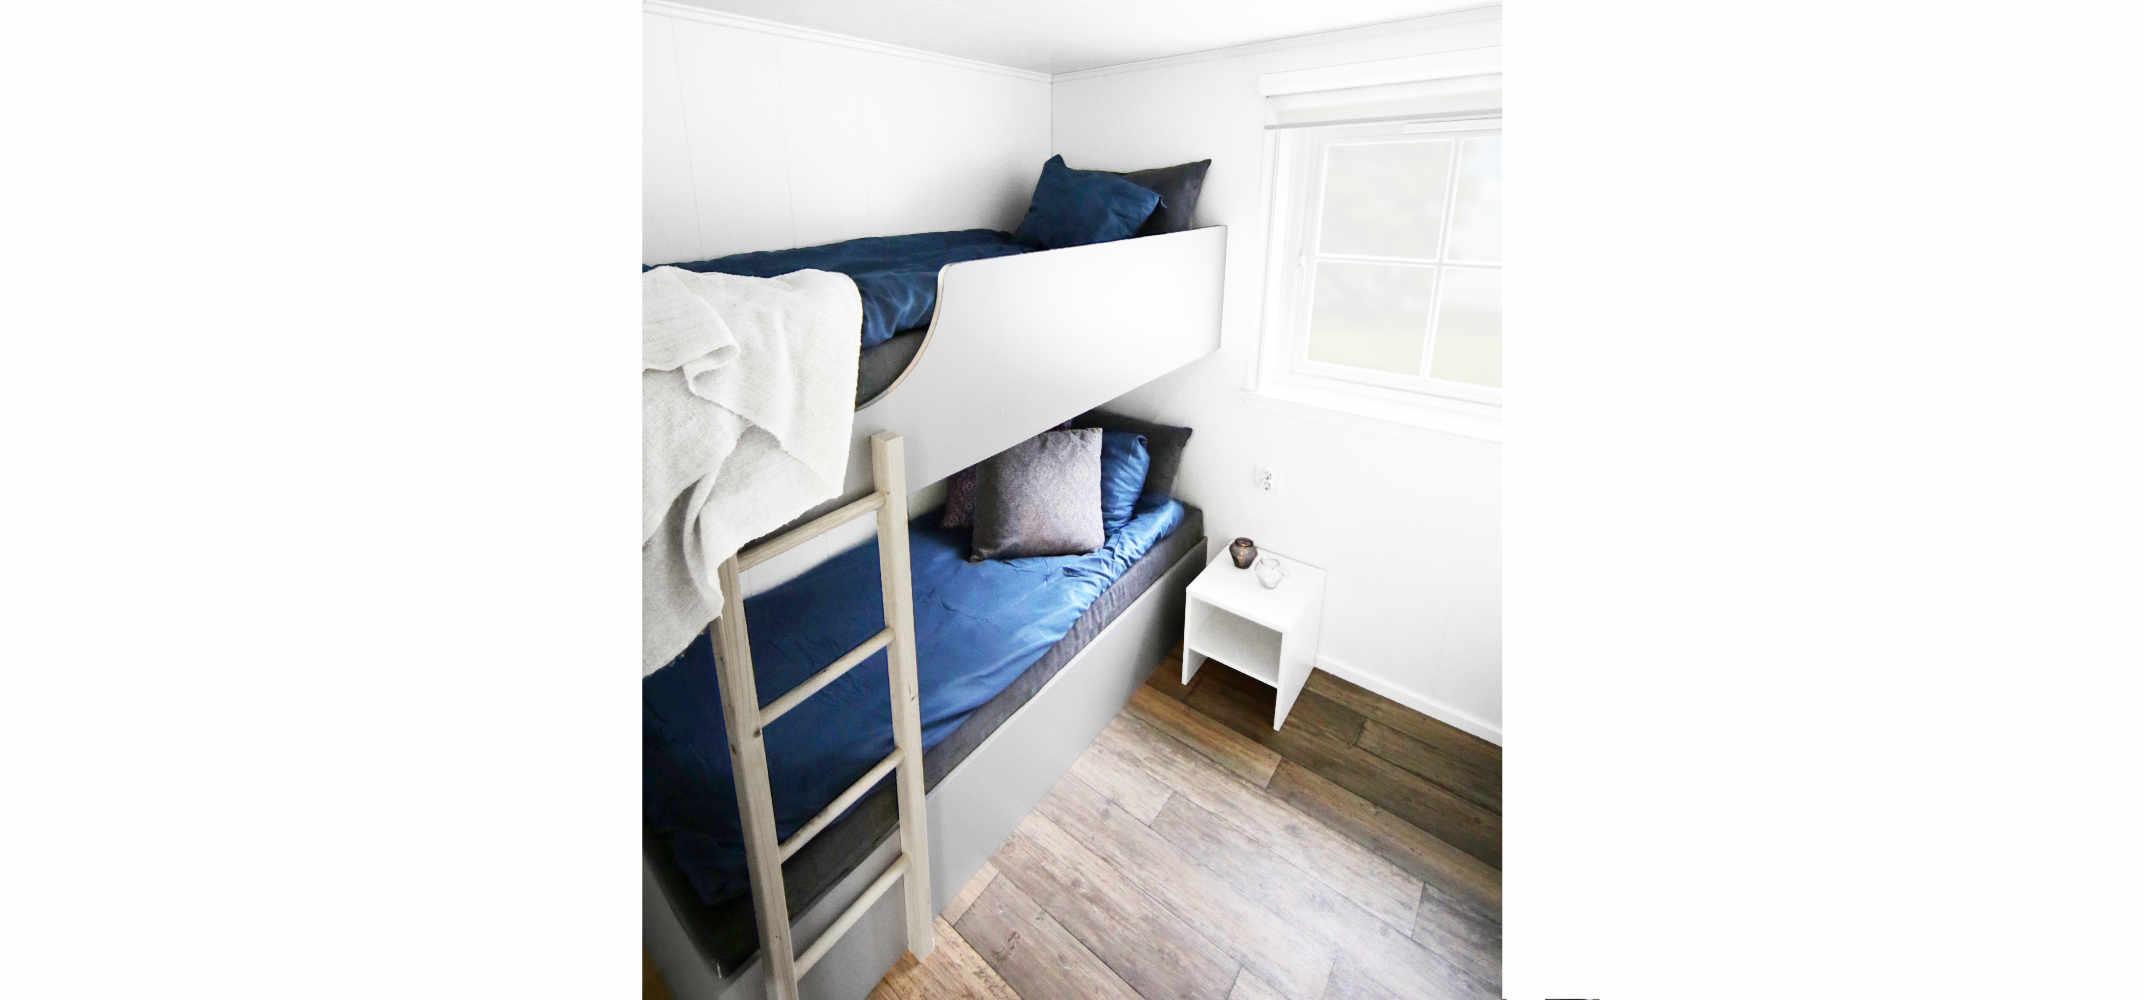 48 Sörby lilla sovrummet besk vitt.jpg